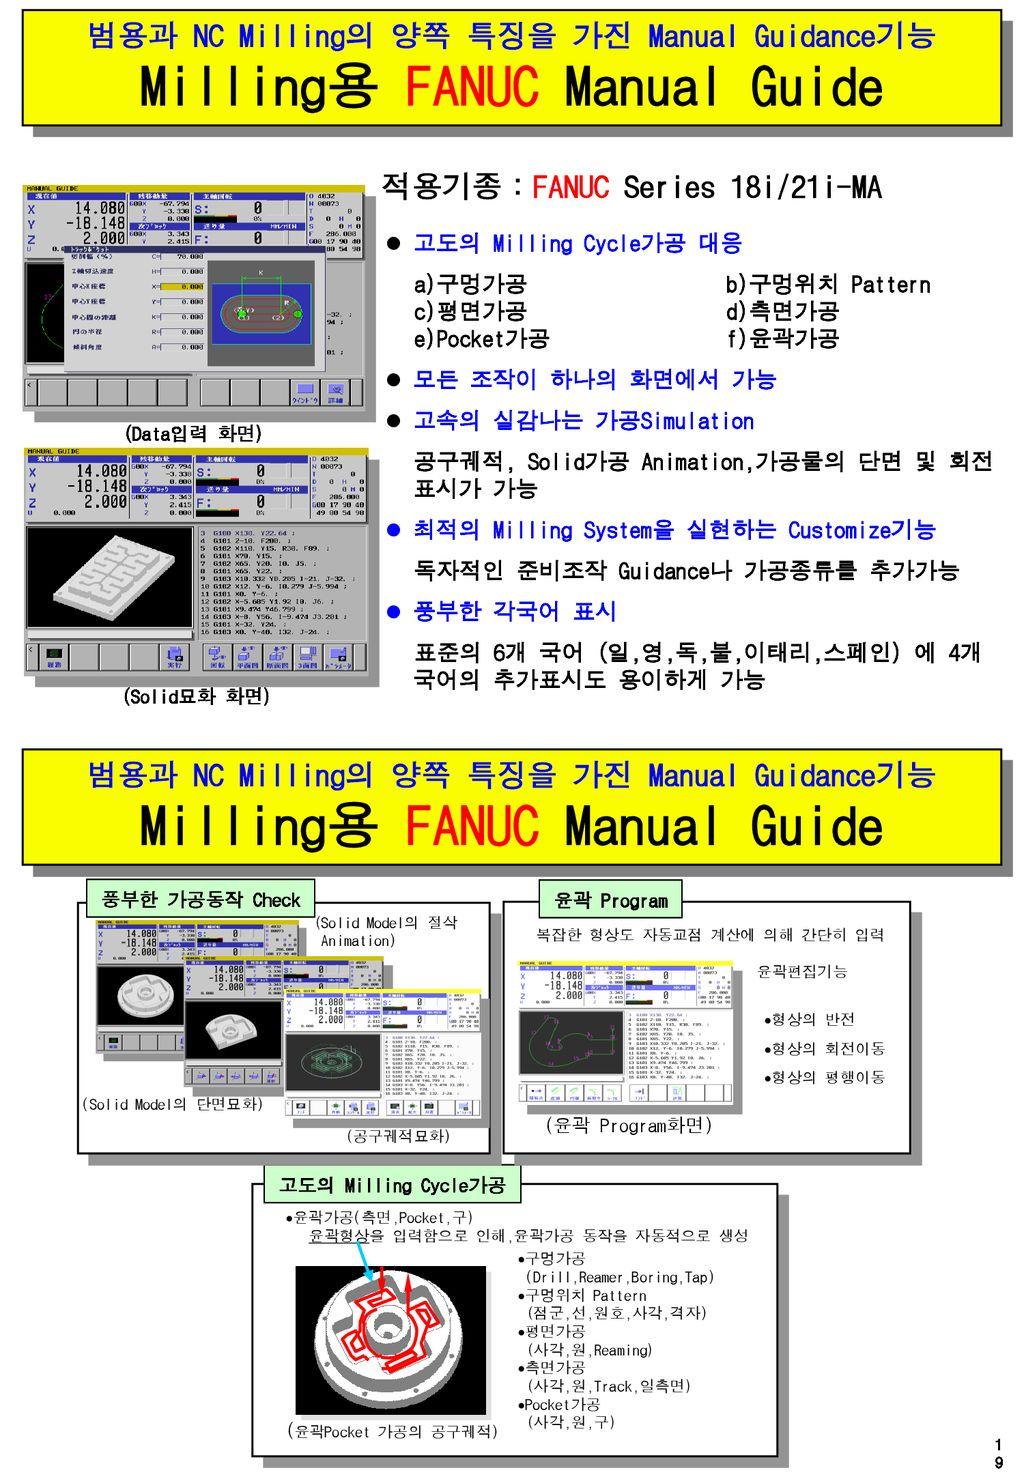 fanuc manual guide i download